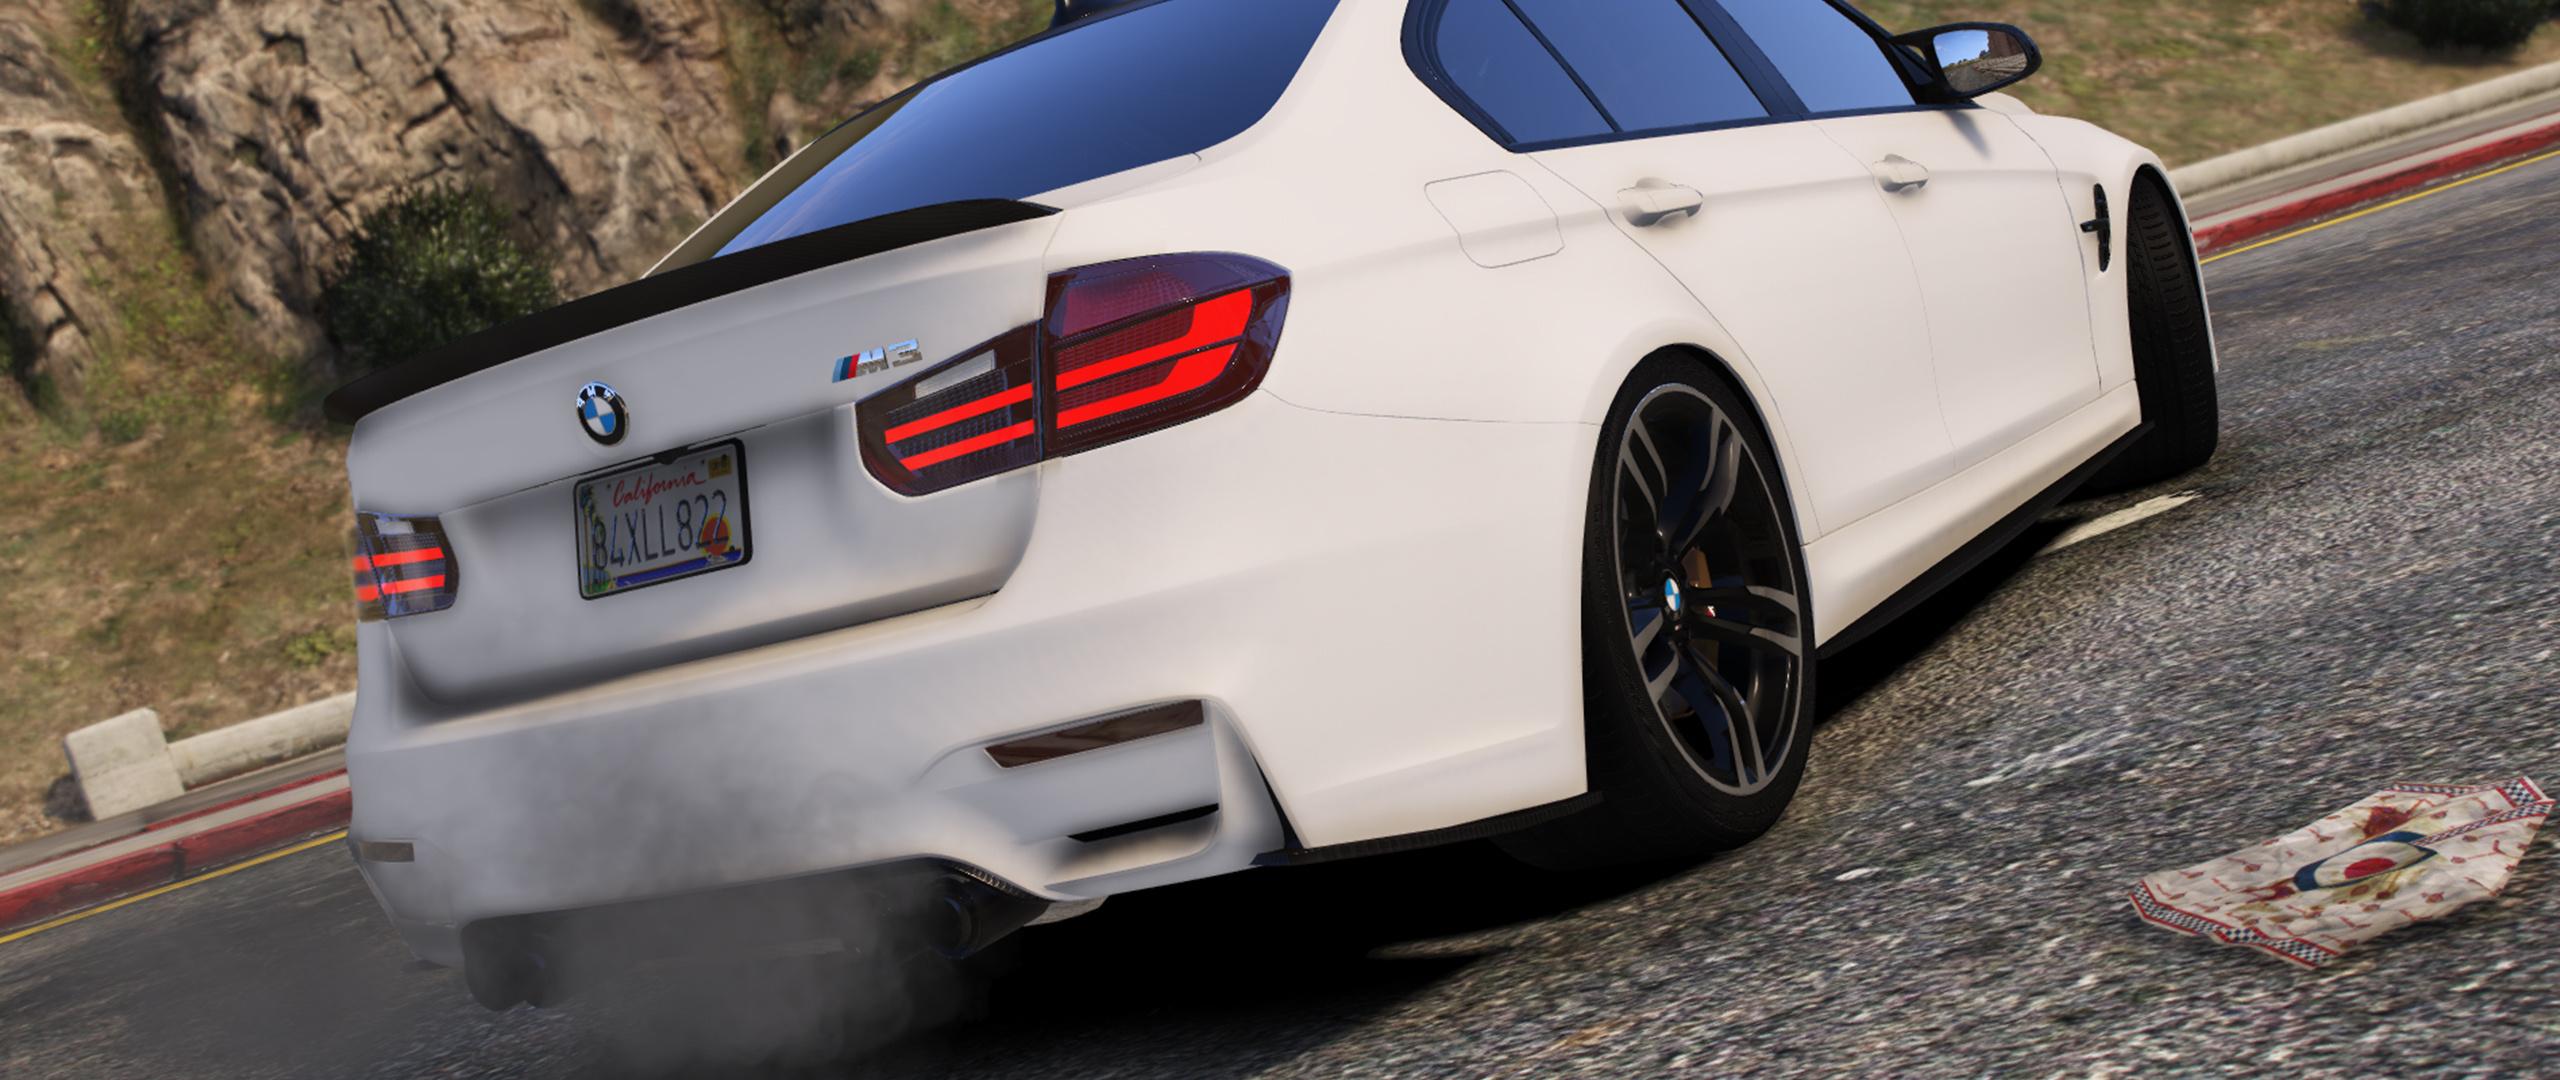 2015 Bmw M3 F80 Add On Tuning Gta5 Mods Com